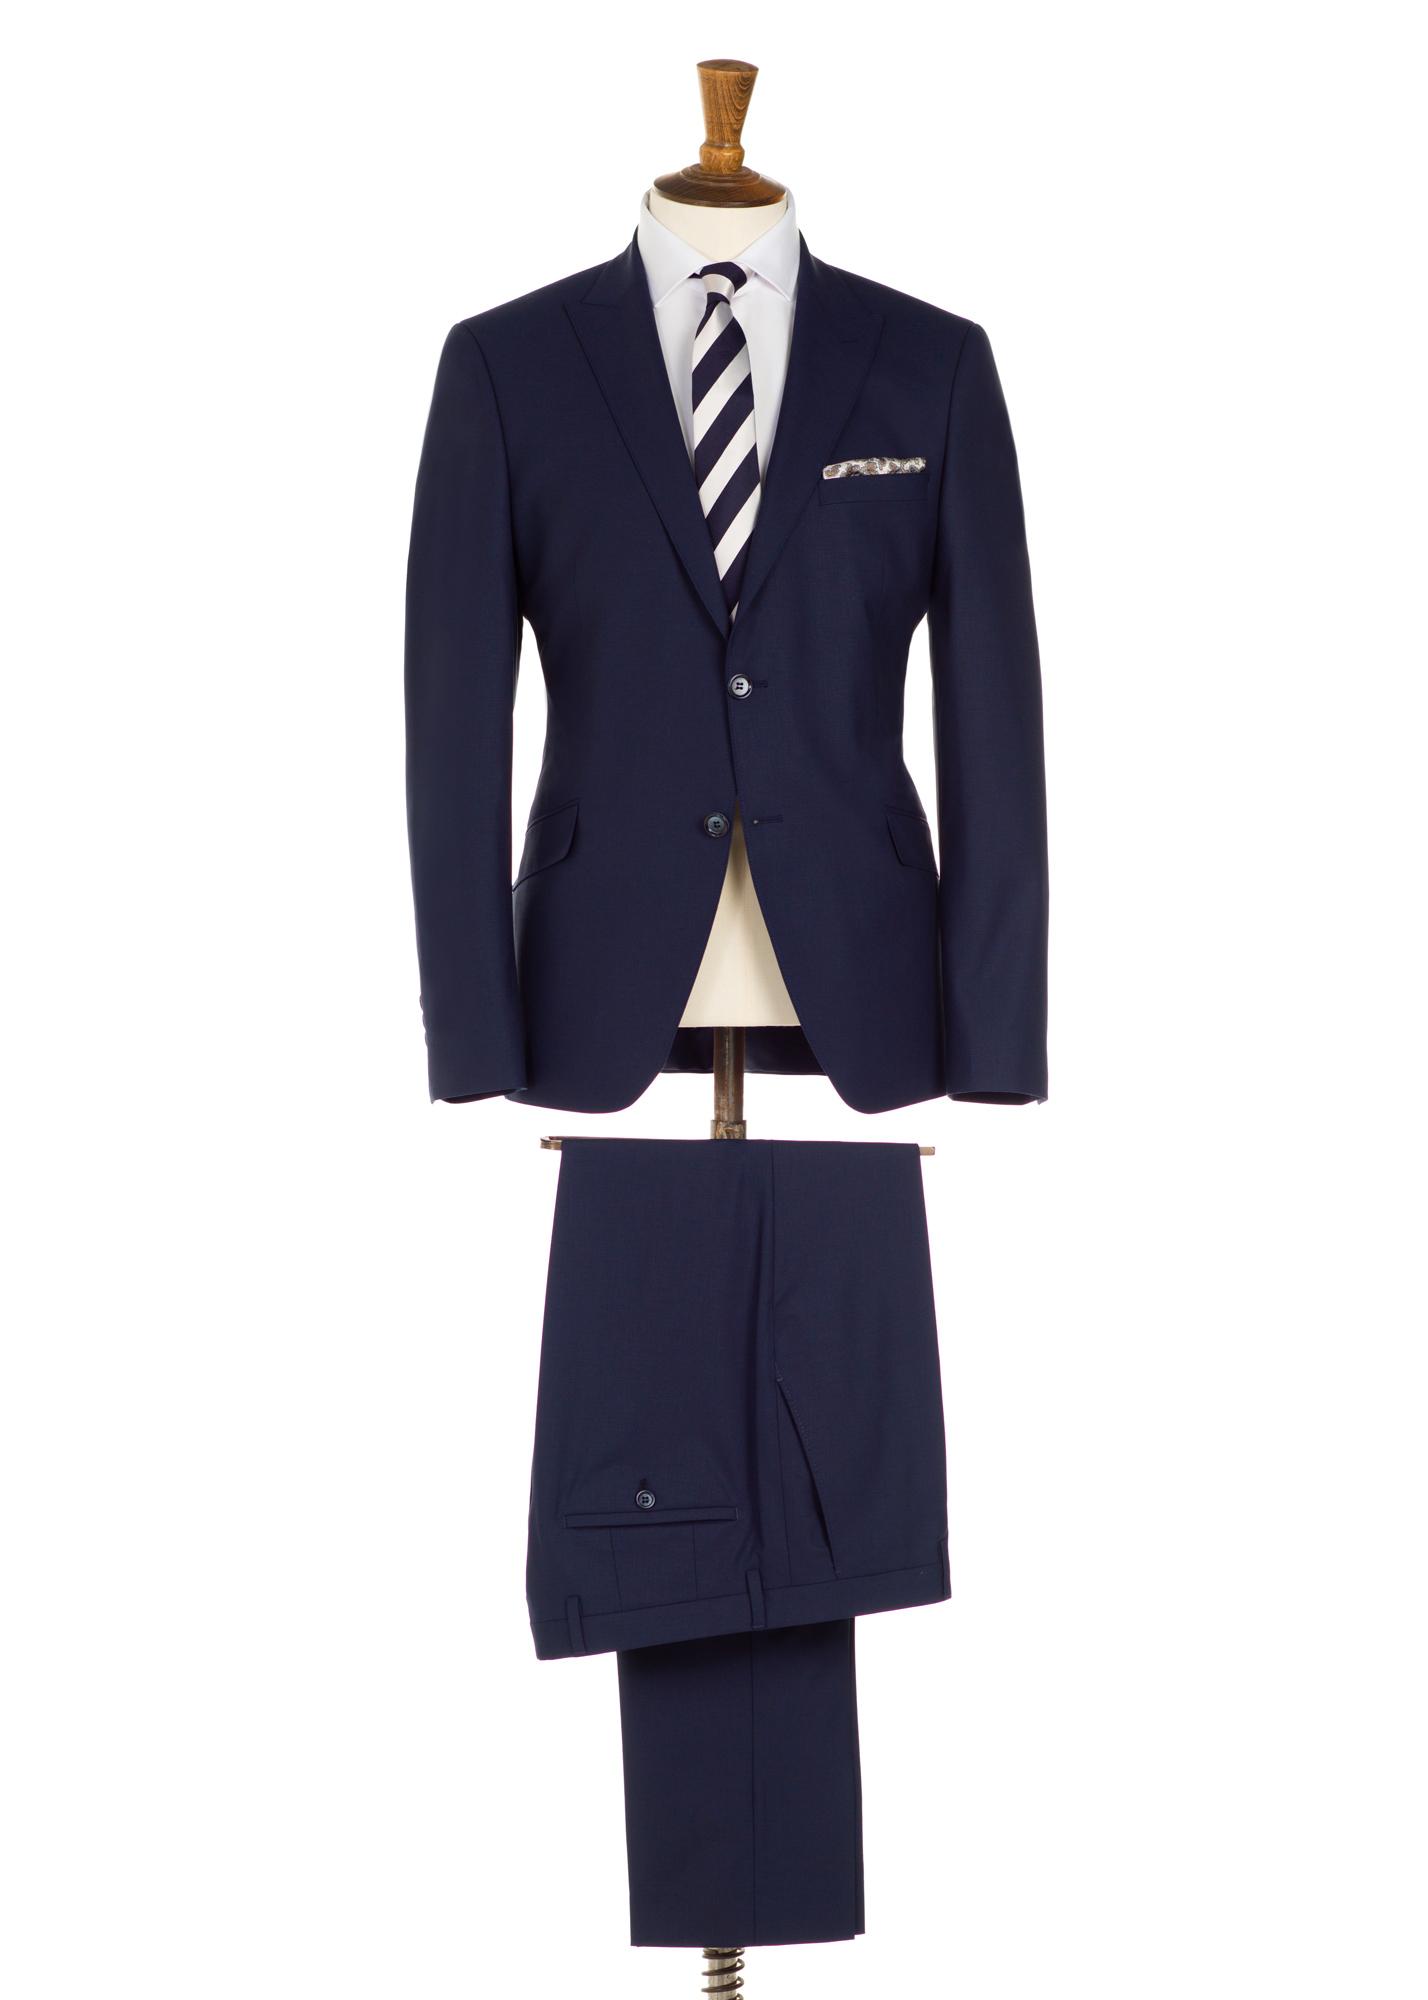 Regency Johnny Navy 3 Piece Suit